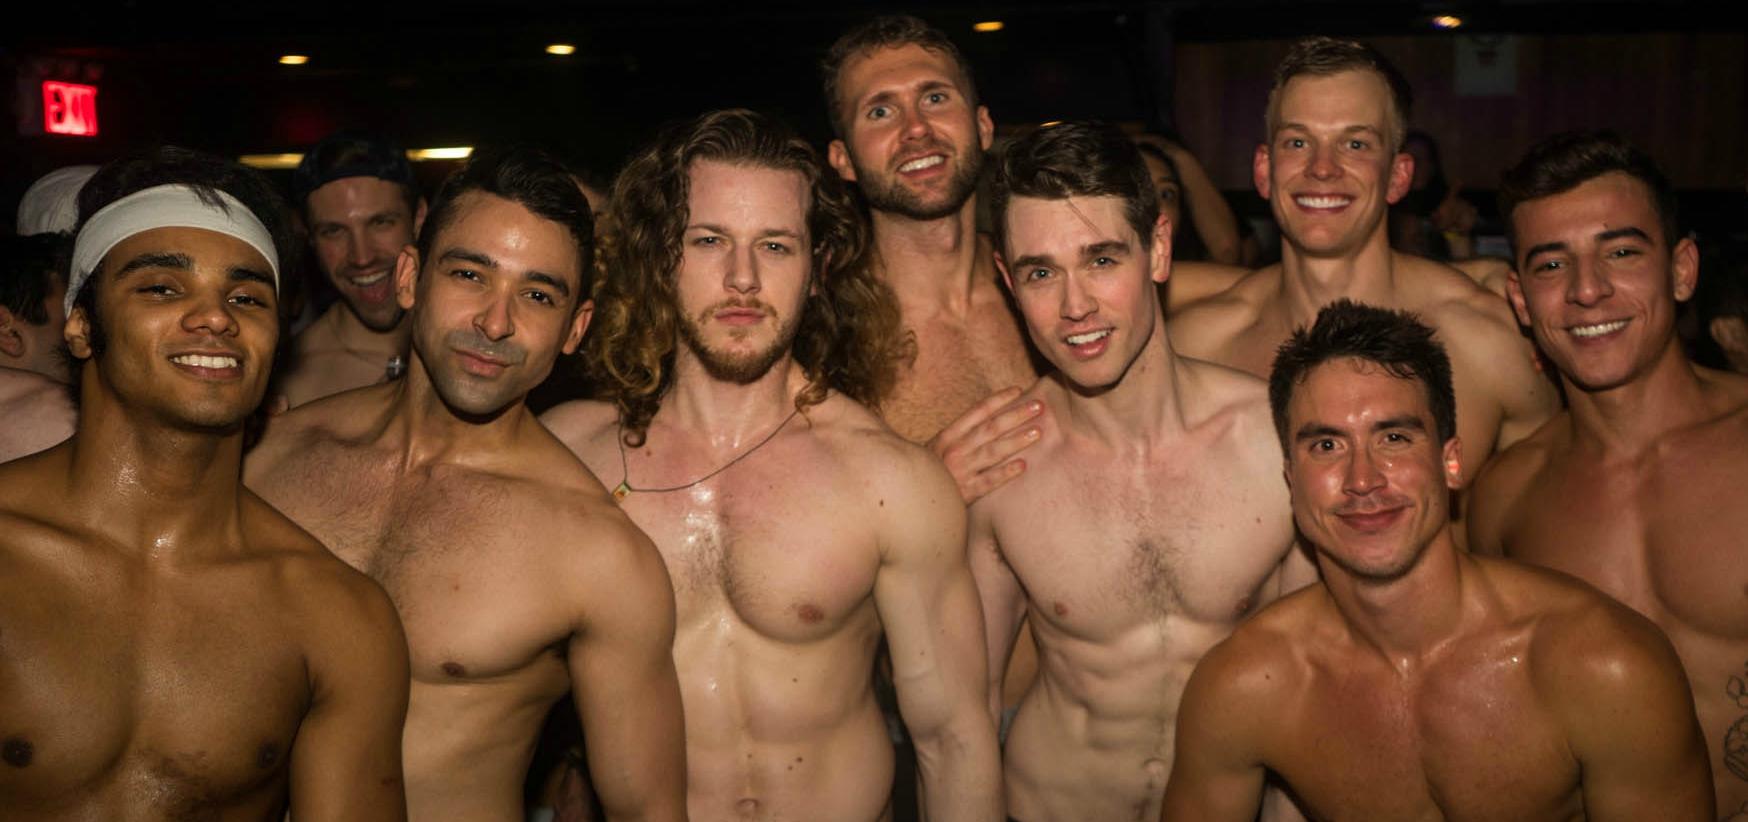 Gay New York Nightlife